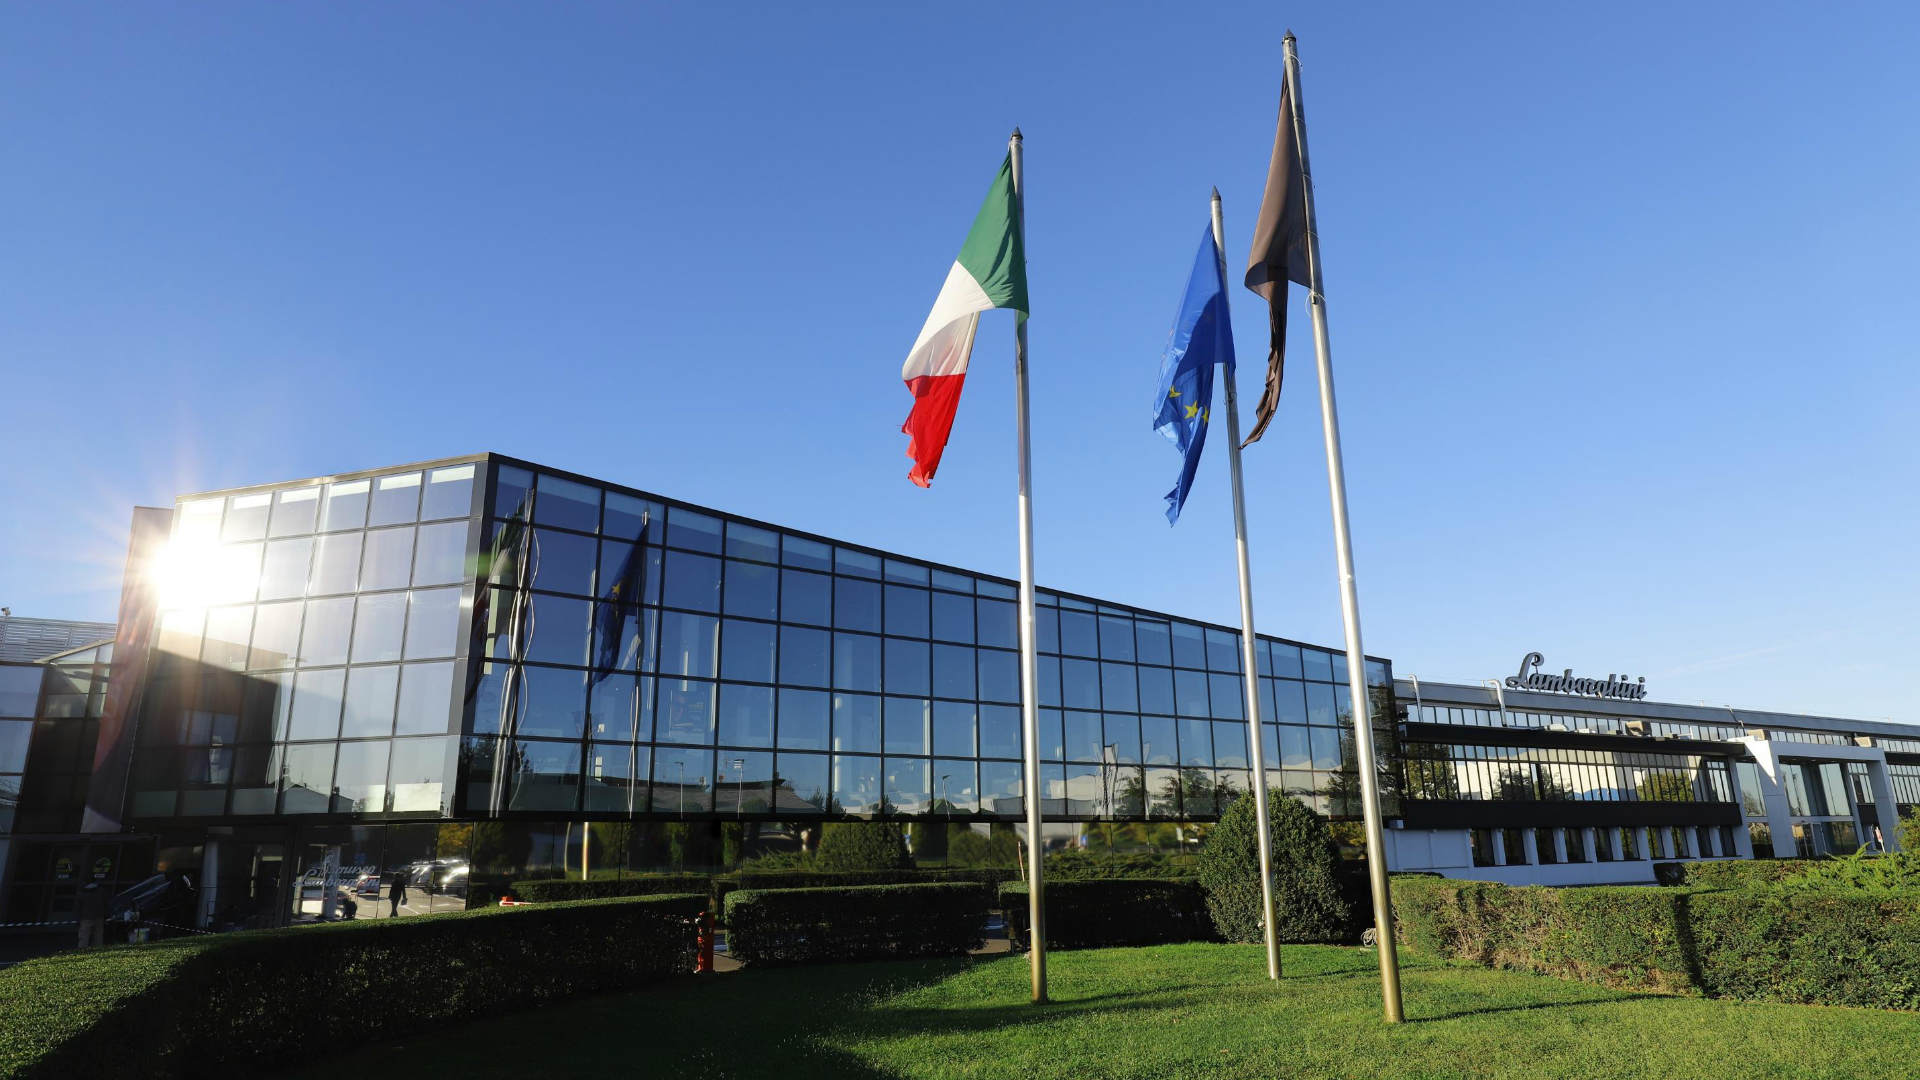 Automobili Lamborghini Italy